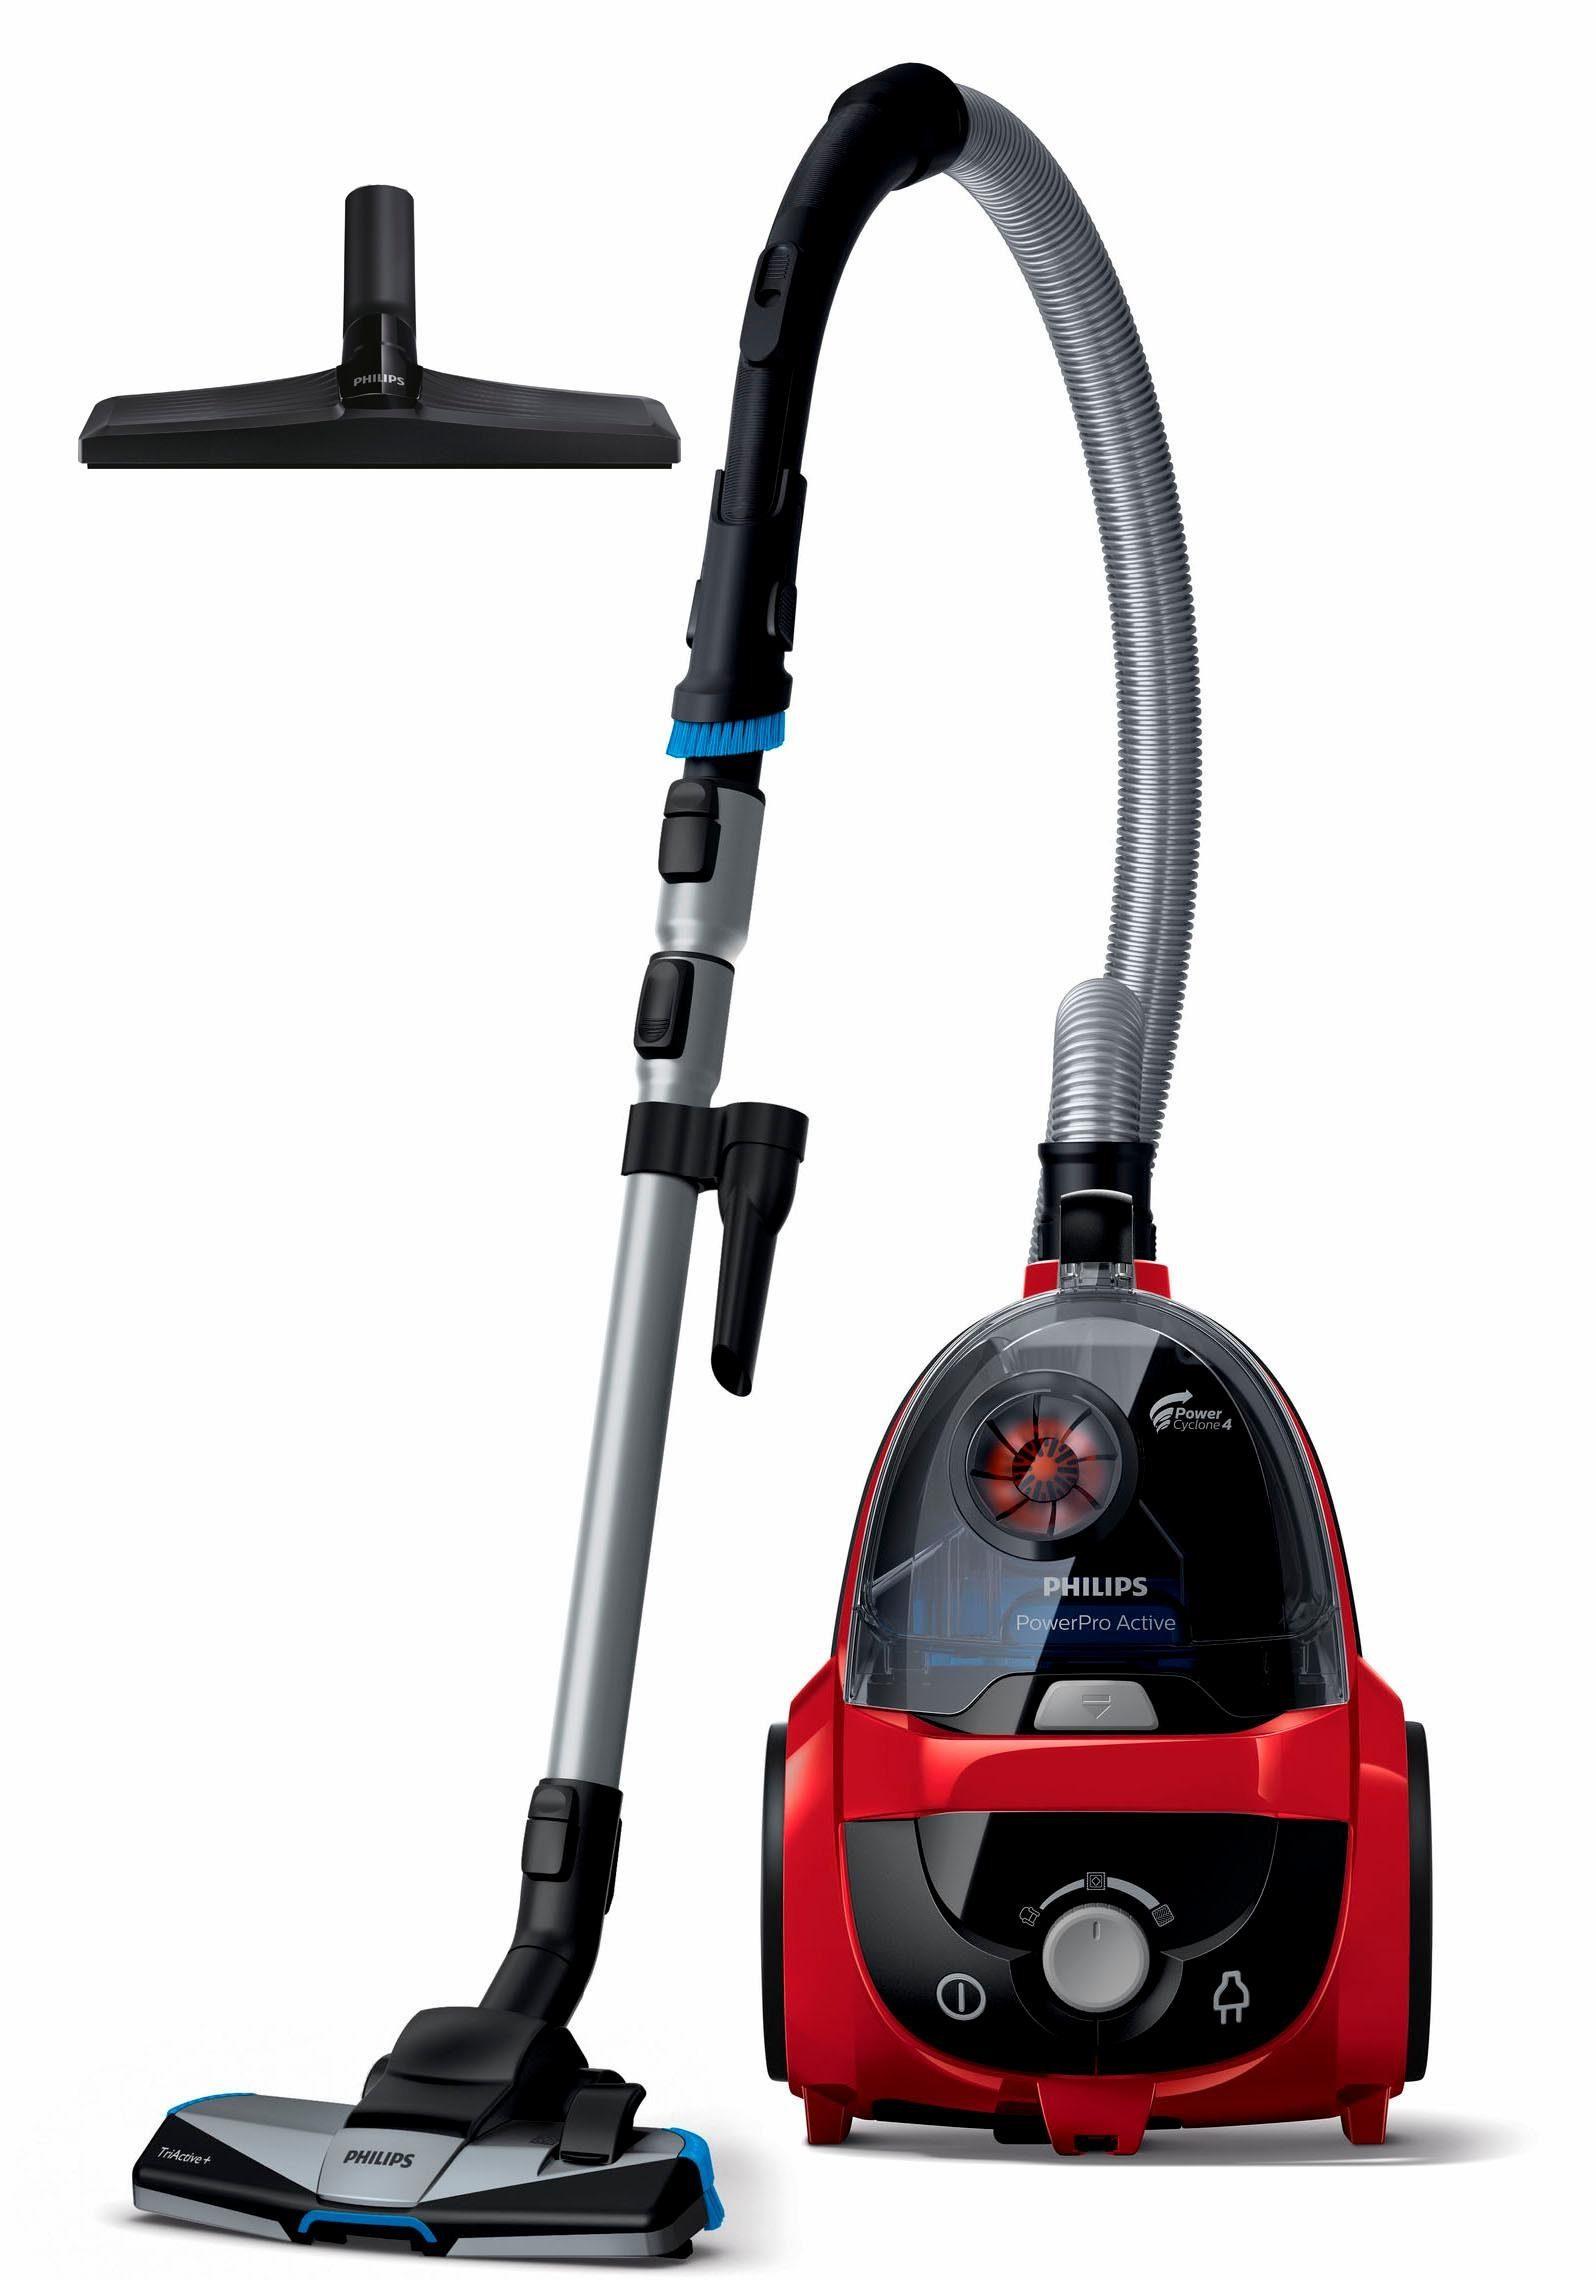 Philips Staubsauger ohne Beutel FC9532/09 PowerPro Active, 750 W, rot